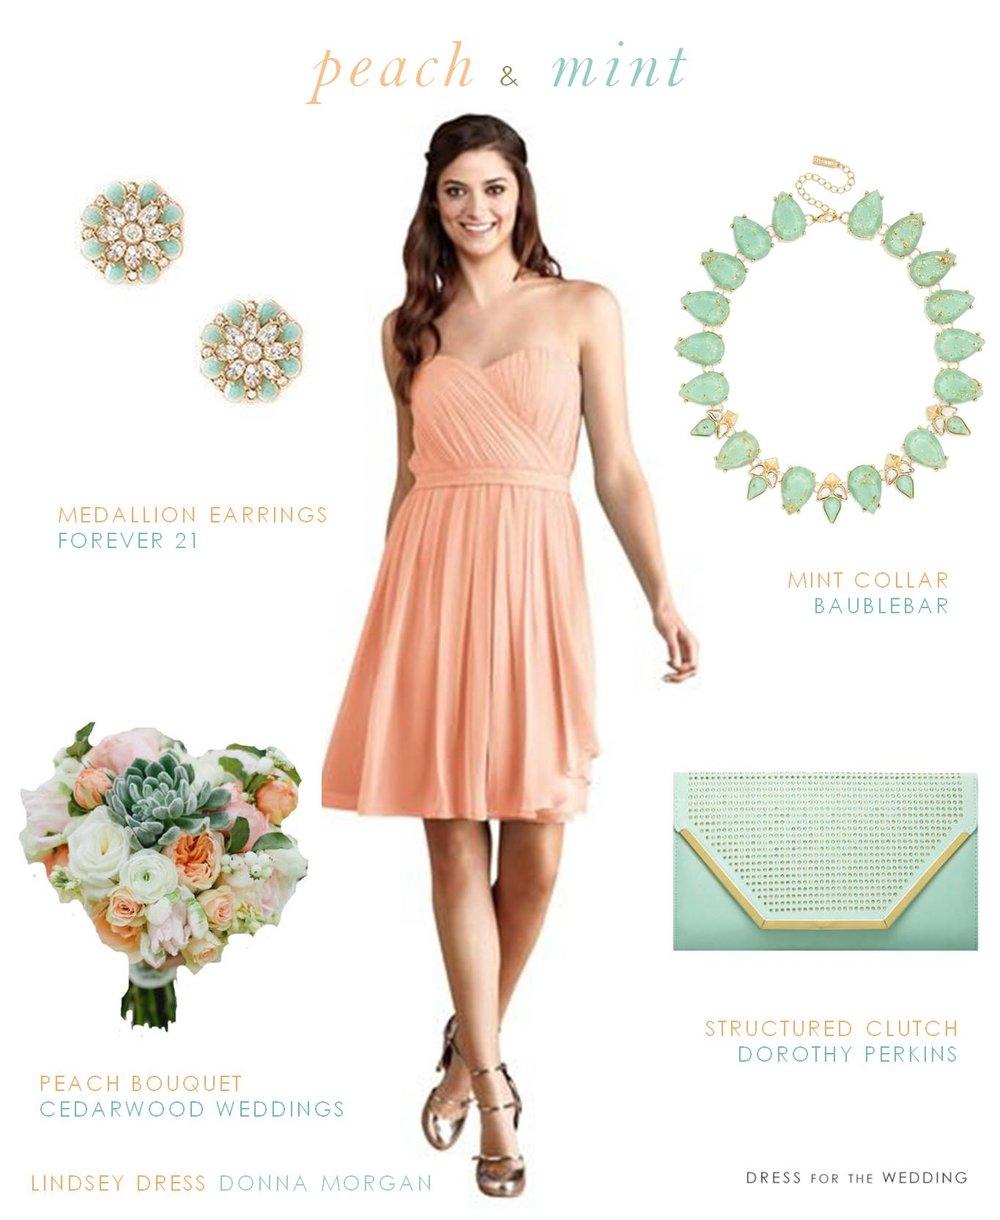 o-peach-dress-aline-necklace-green-bag-clutch-studs-mint-howtowear-fashion-style-outfit-spring-summer-wedding-brun-dinner.jpg